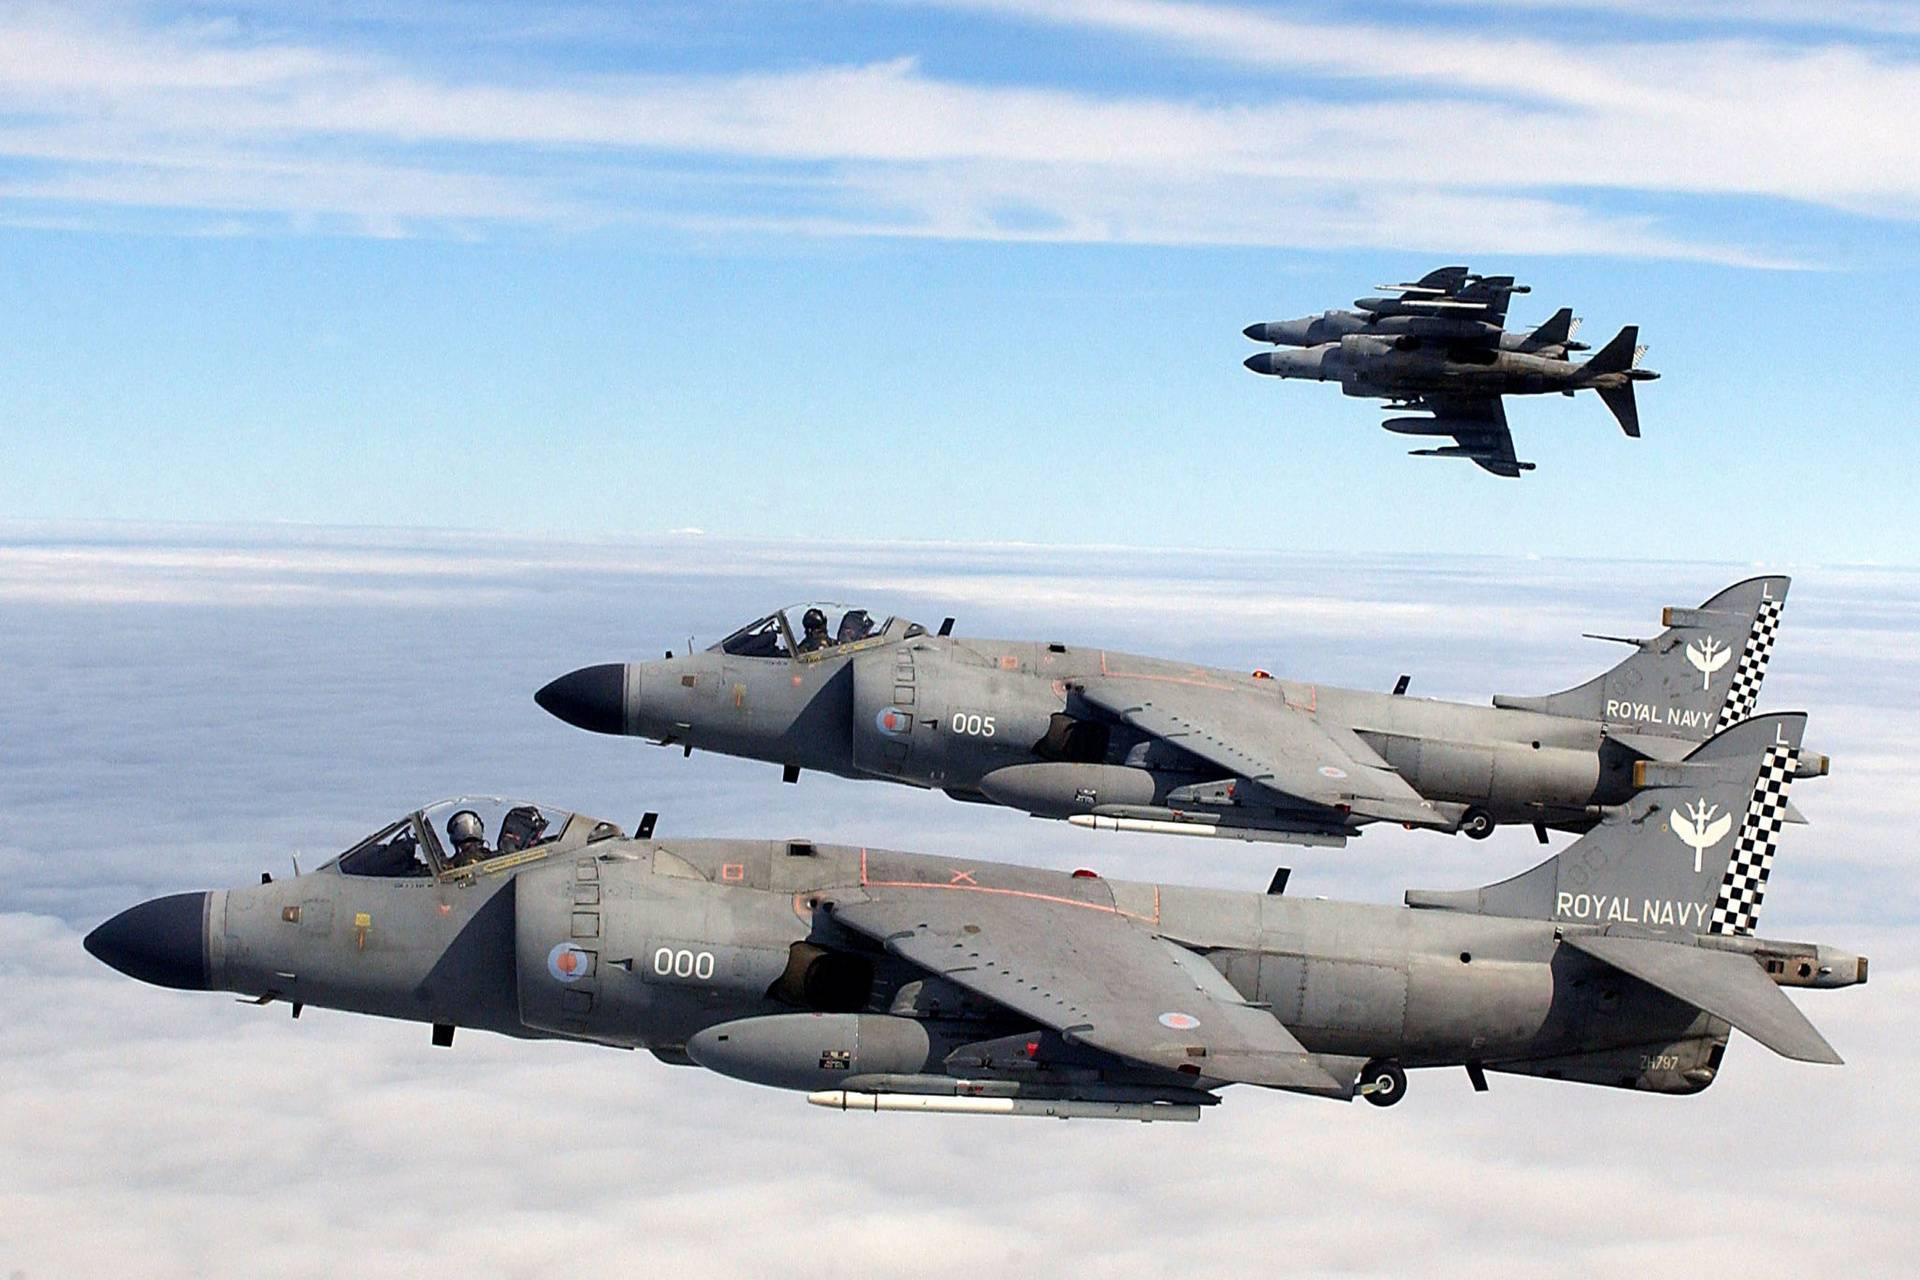 801 squadron